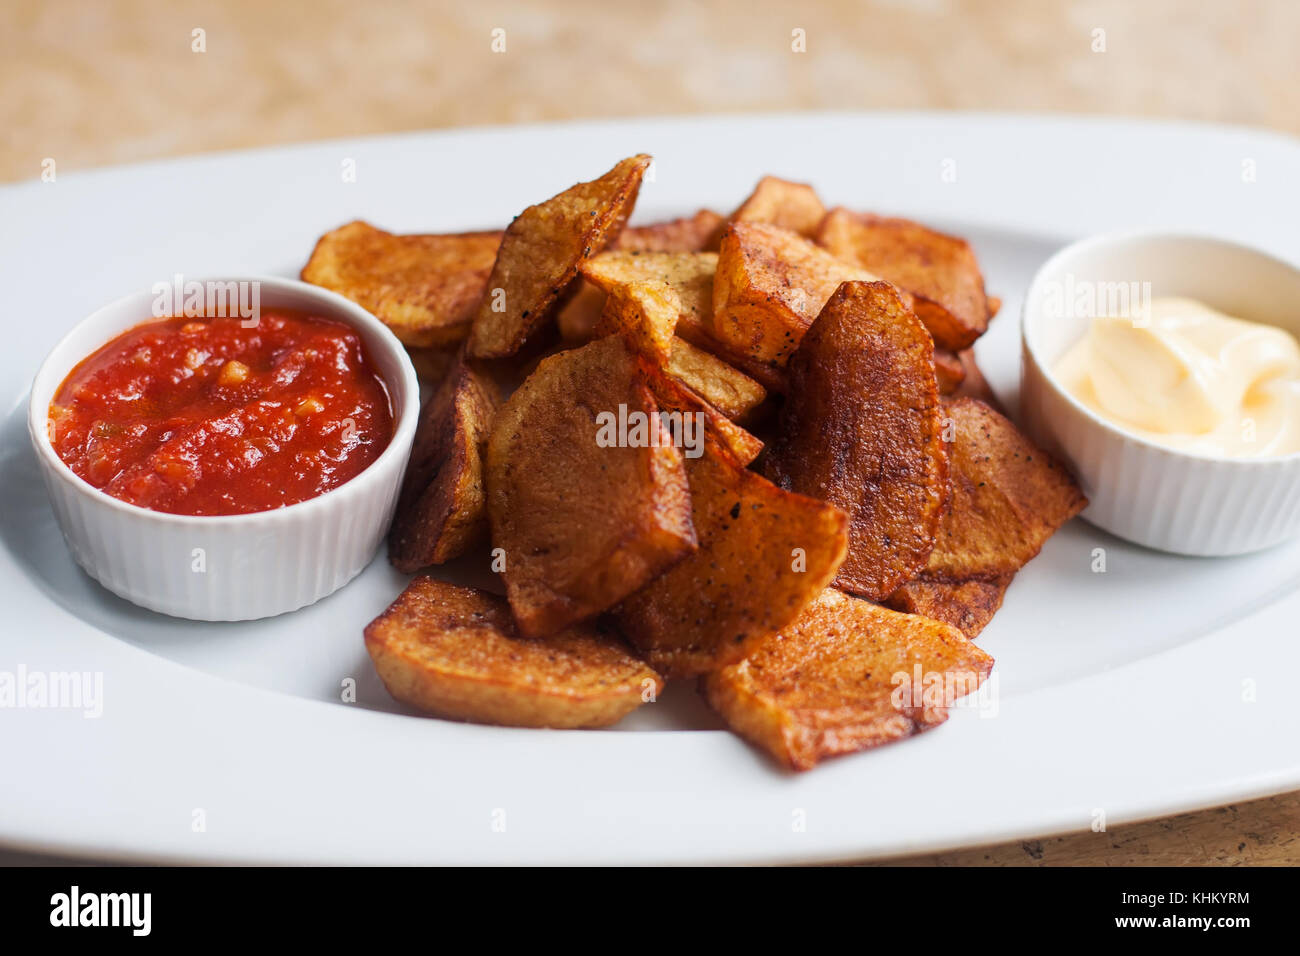 Spanish cuisine food tapas Patatas bravas, fried potato with red tomato white aioli sauce. Selective focus photo Stock Photo